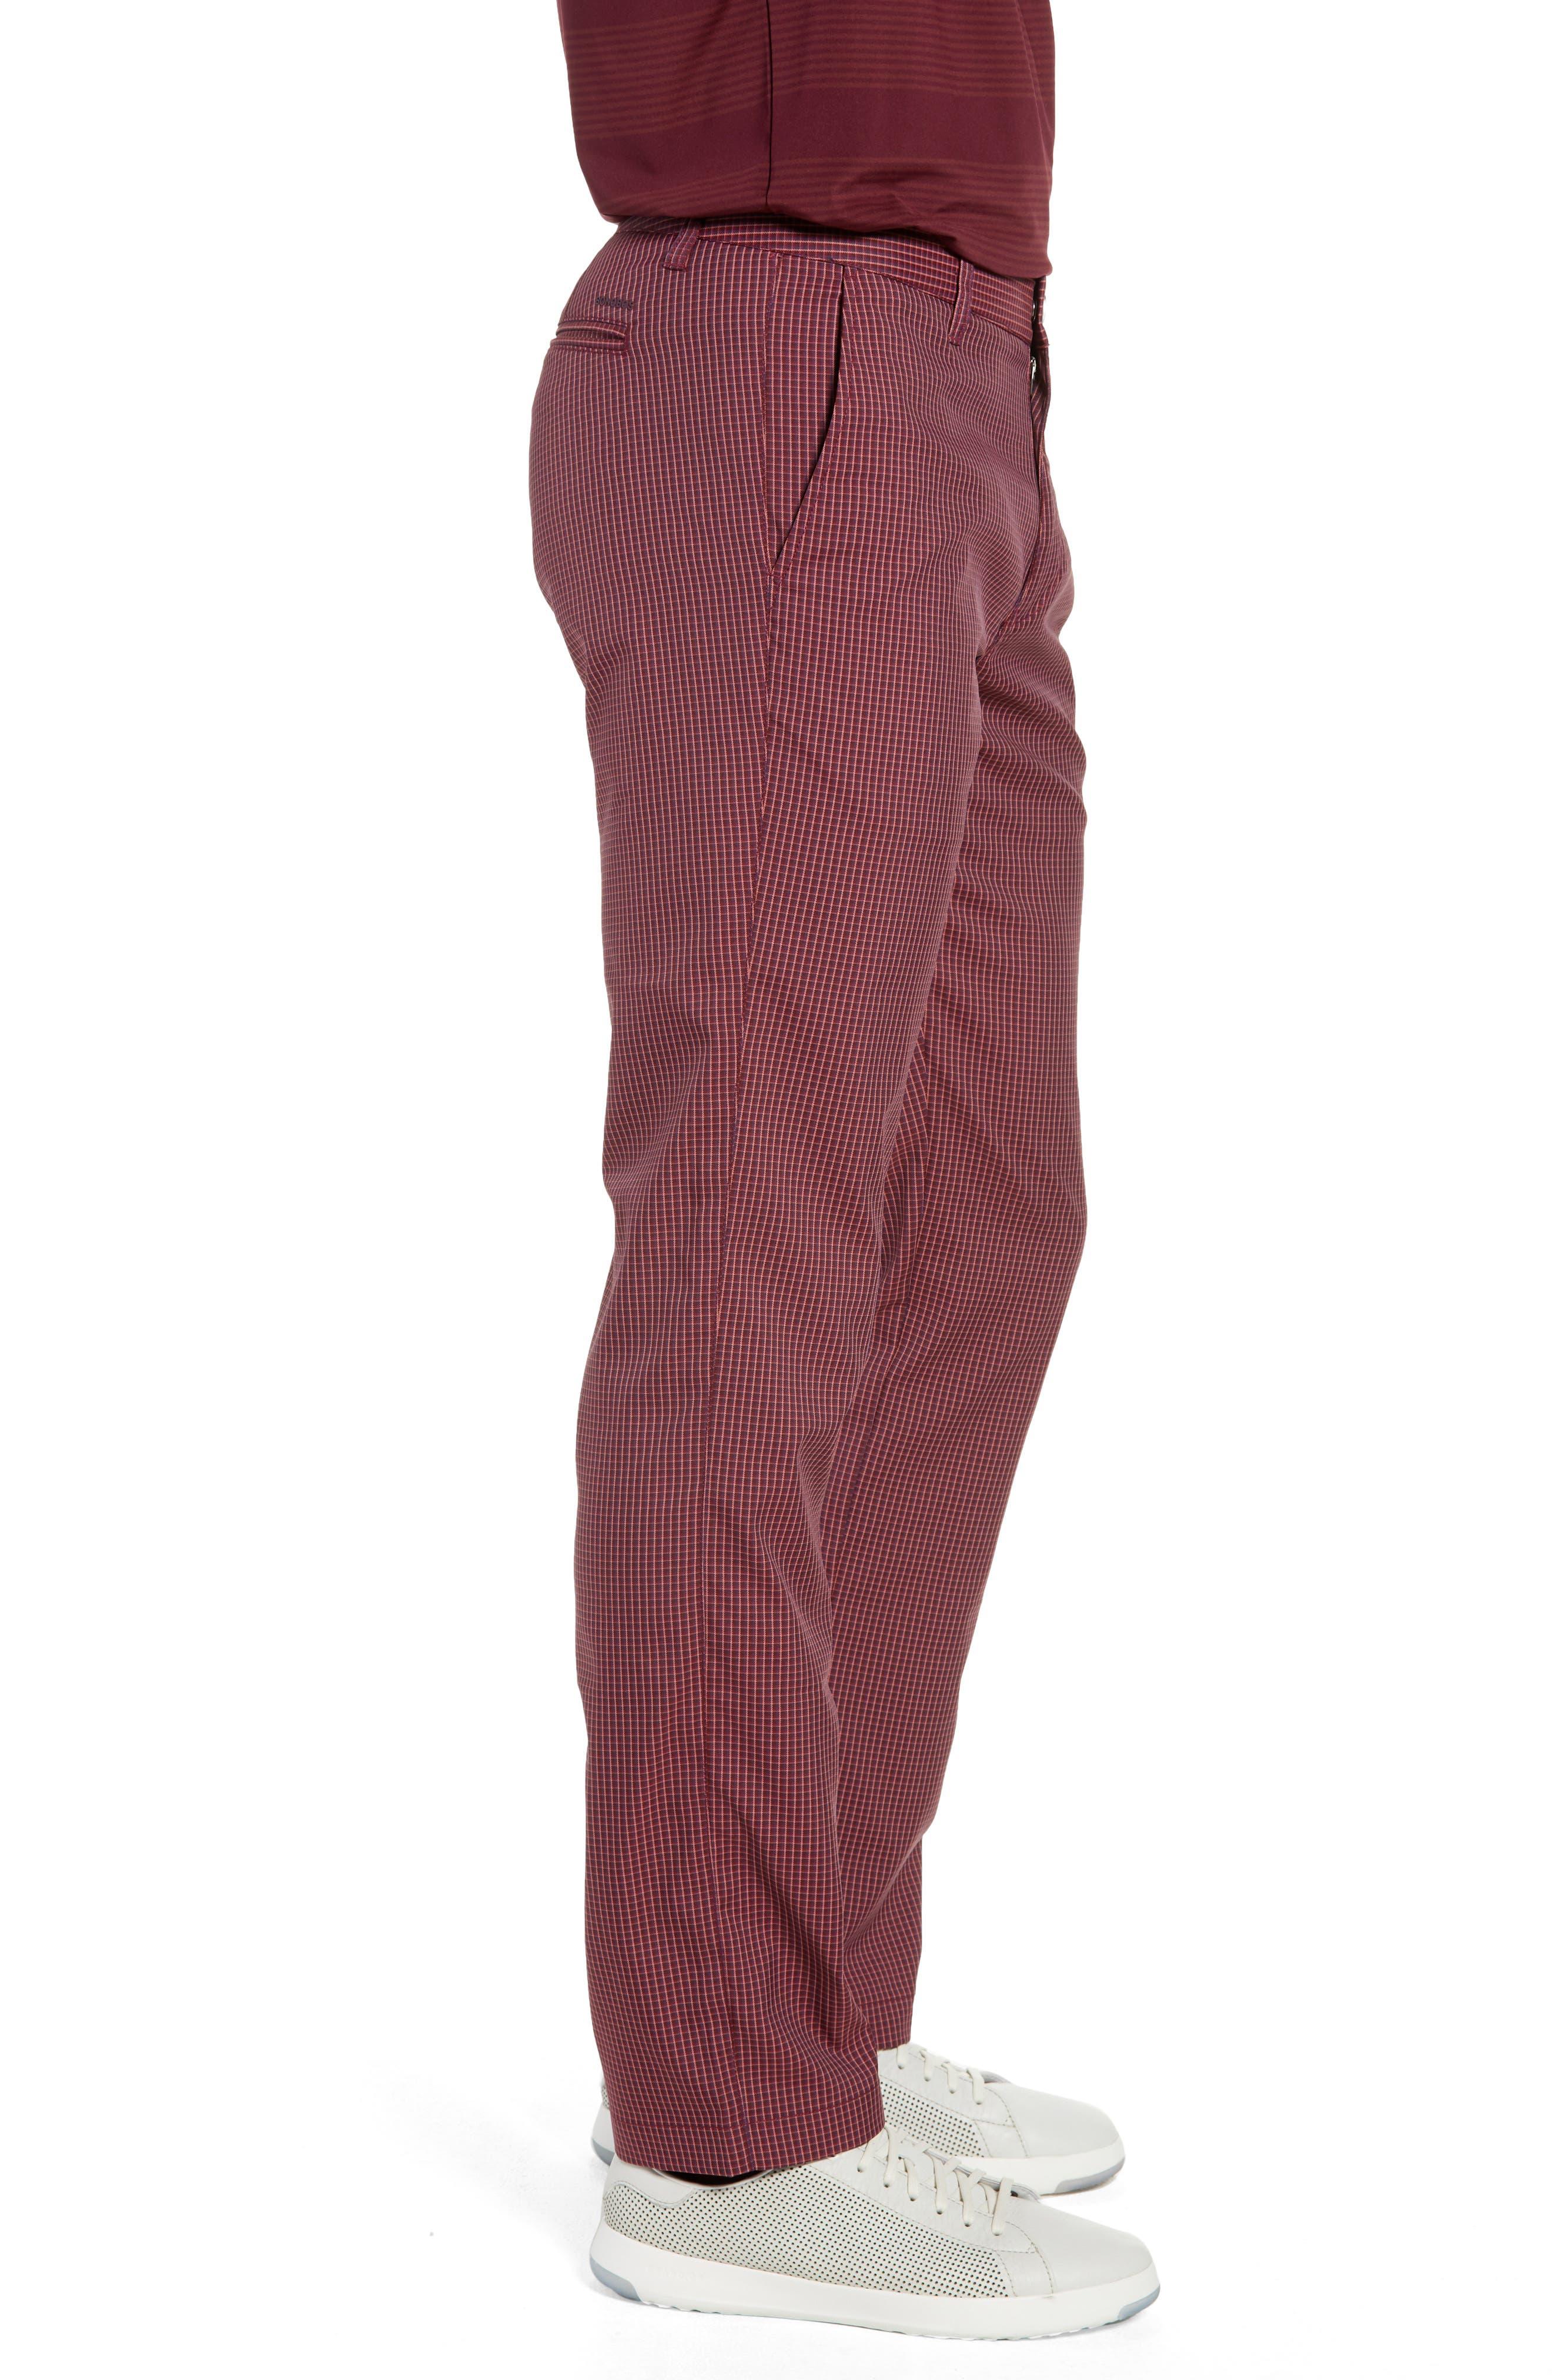 Highland Slim Fit Golf Pants,                             Alternate thumbnail 3, color,                             RED PLAID